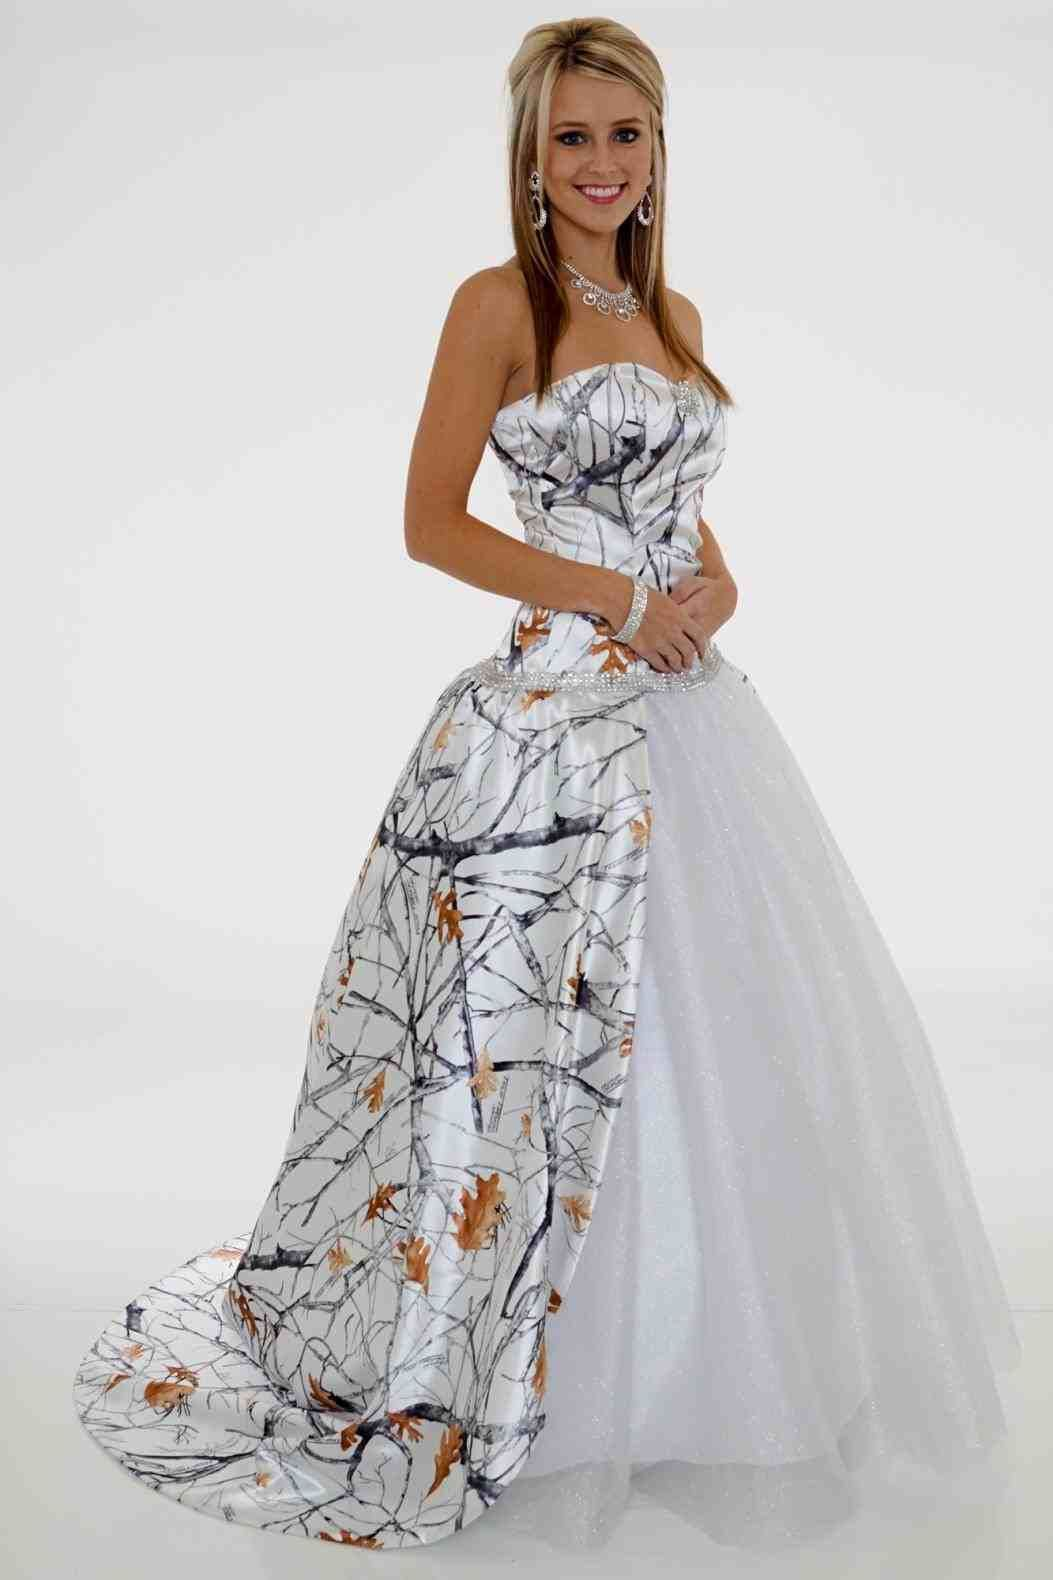 Realtree wedding dresses  snow white camo wedding dress  Weddings  Pinterest  Camo wedding